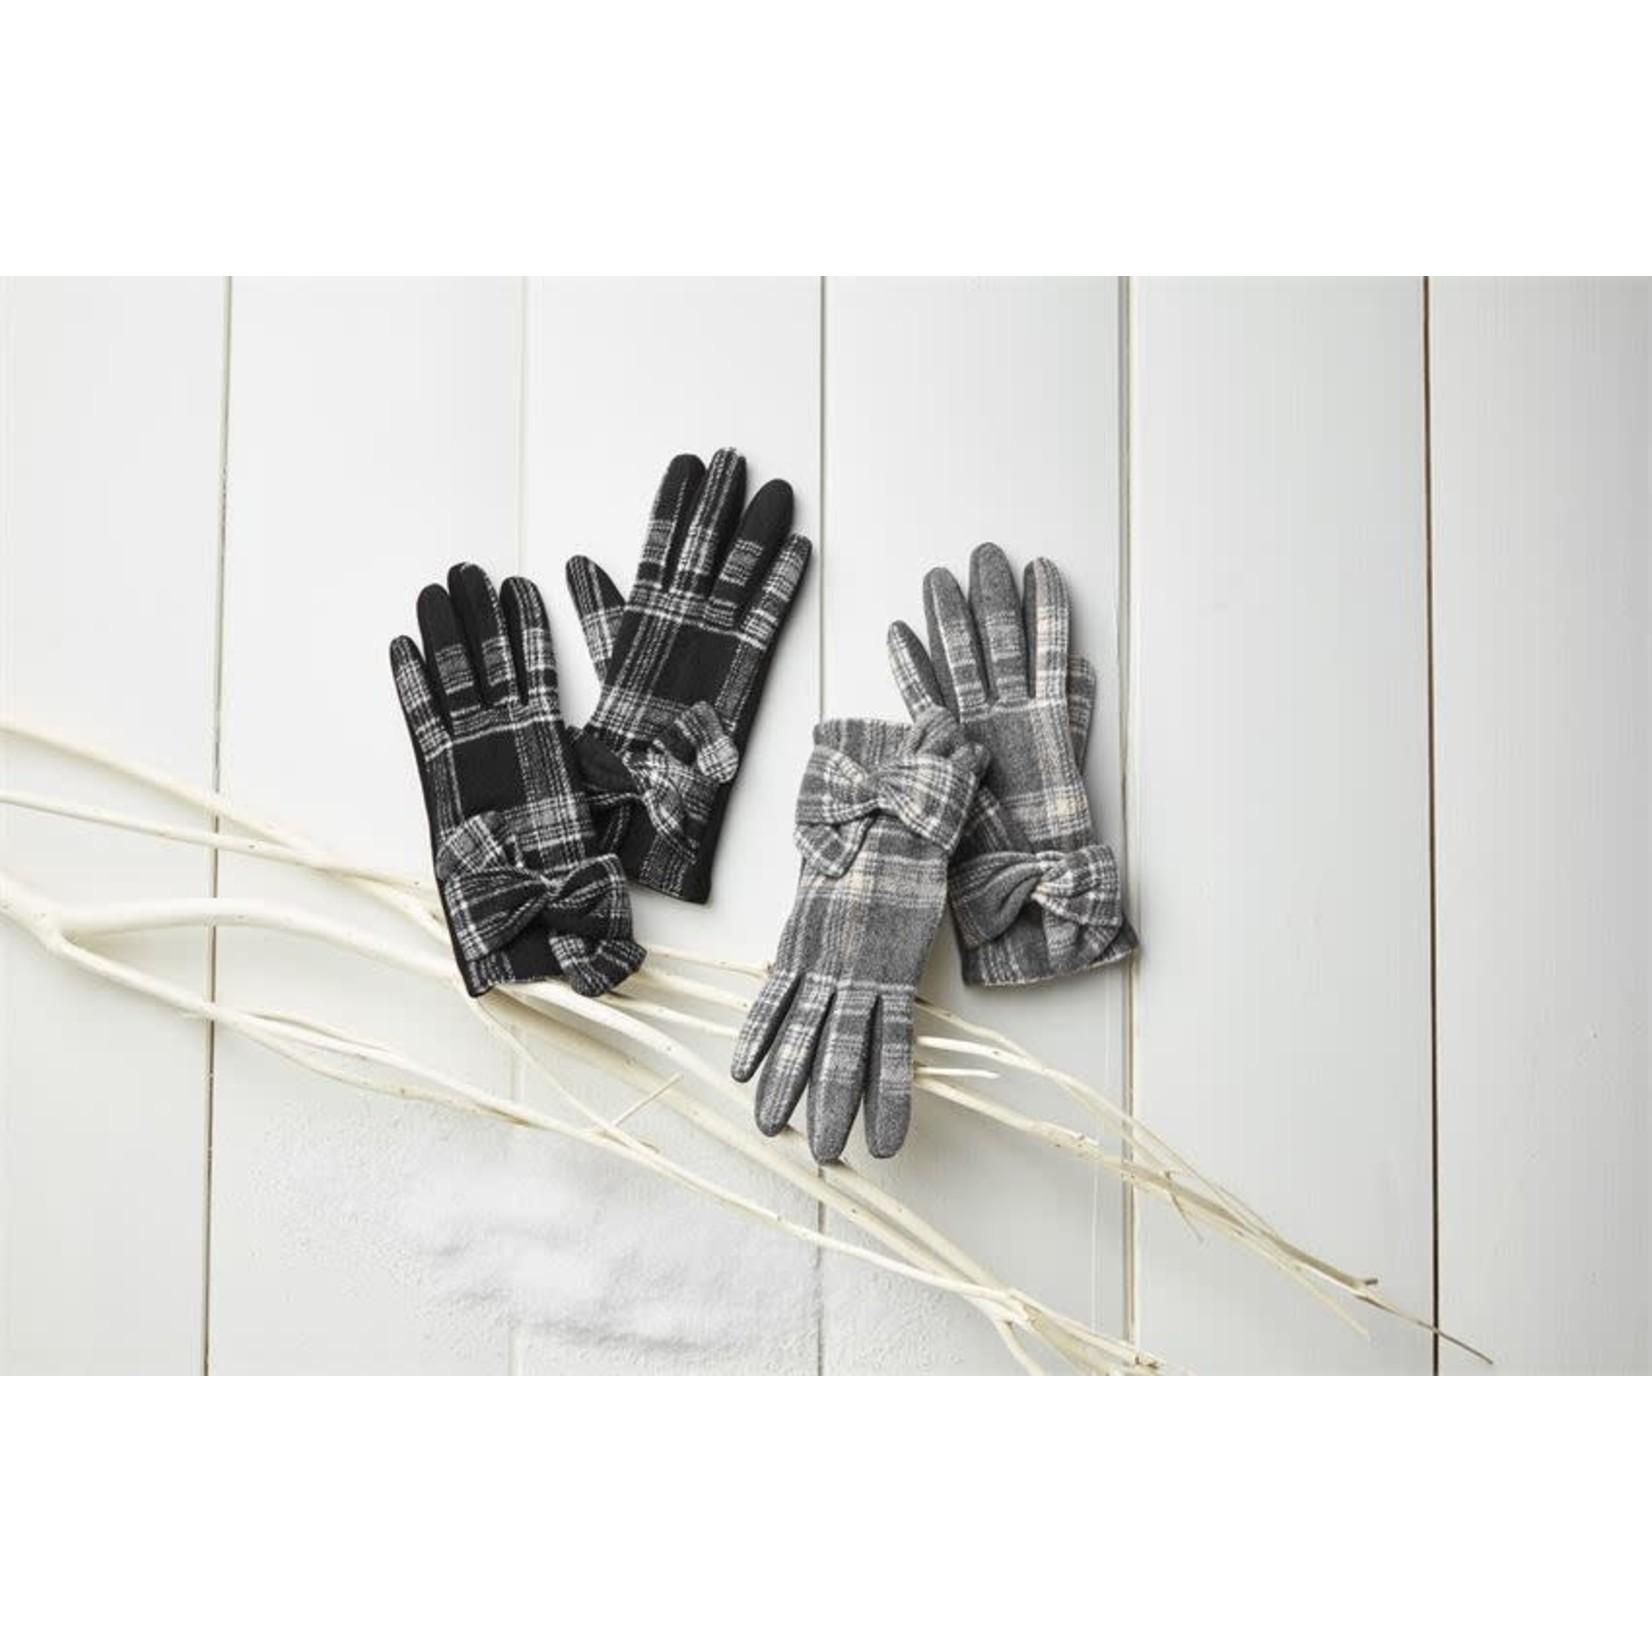 Plaid Knot Glove in Black